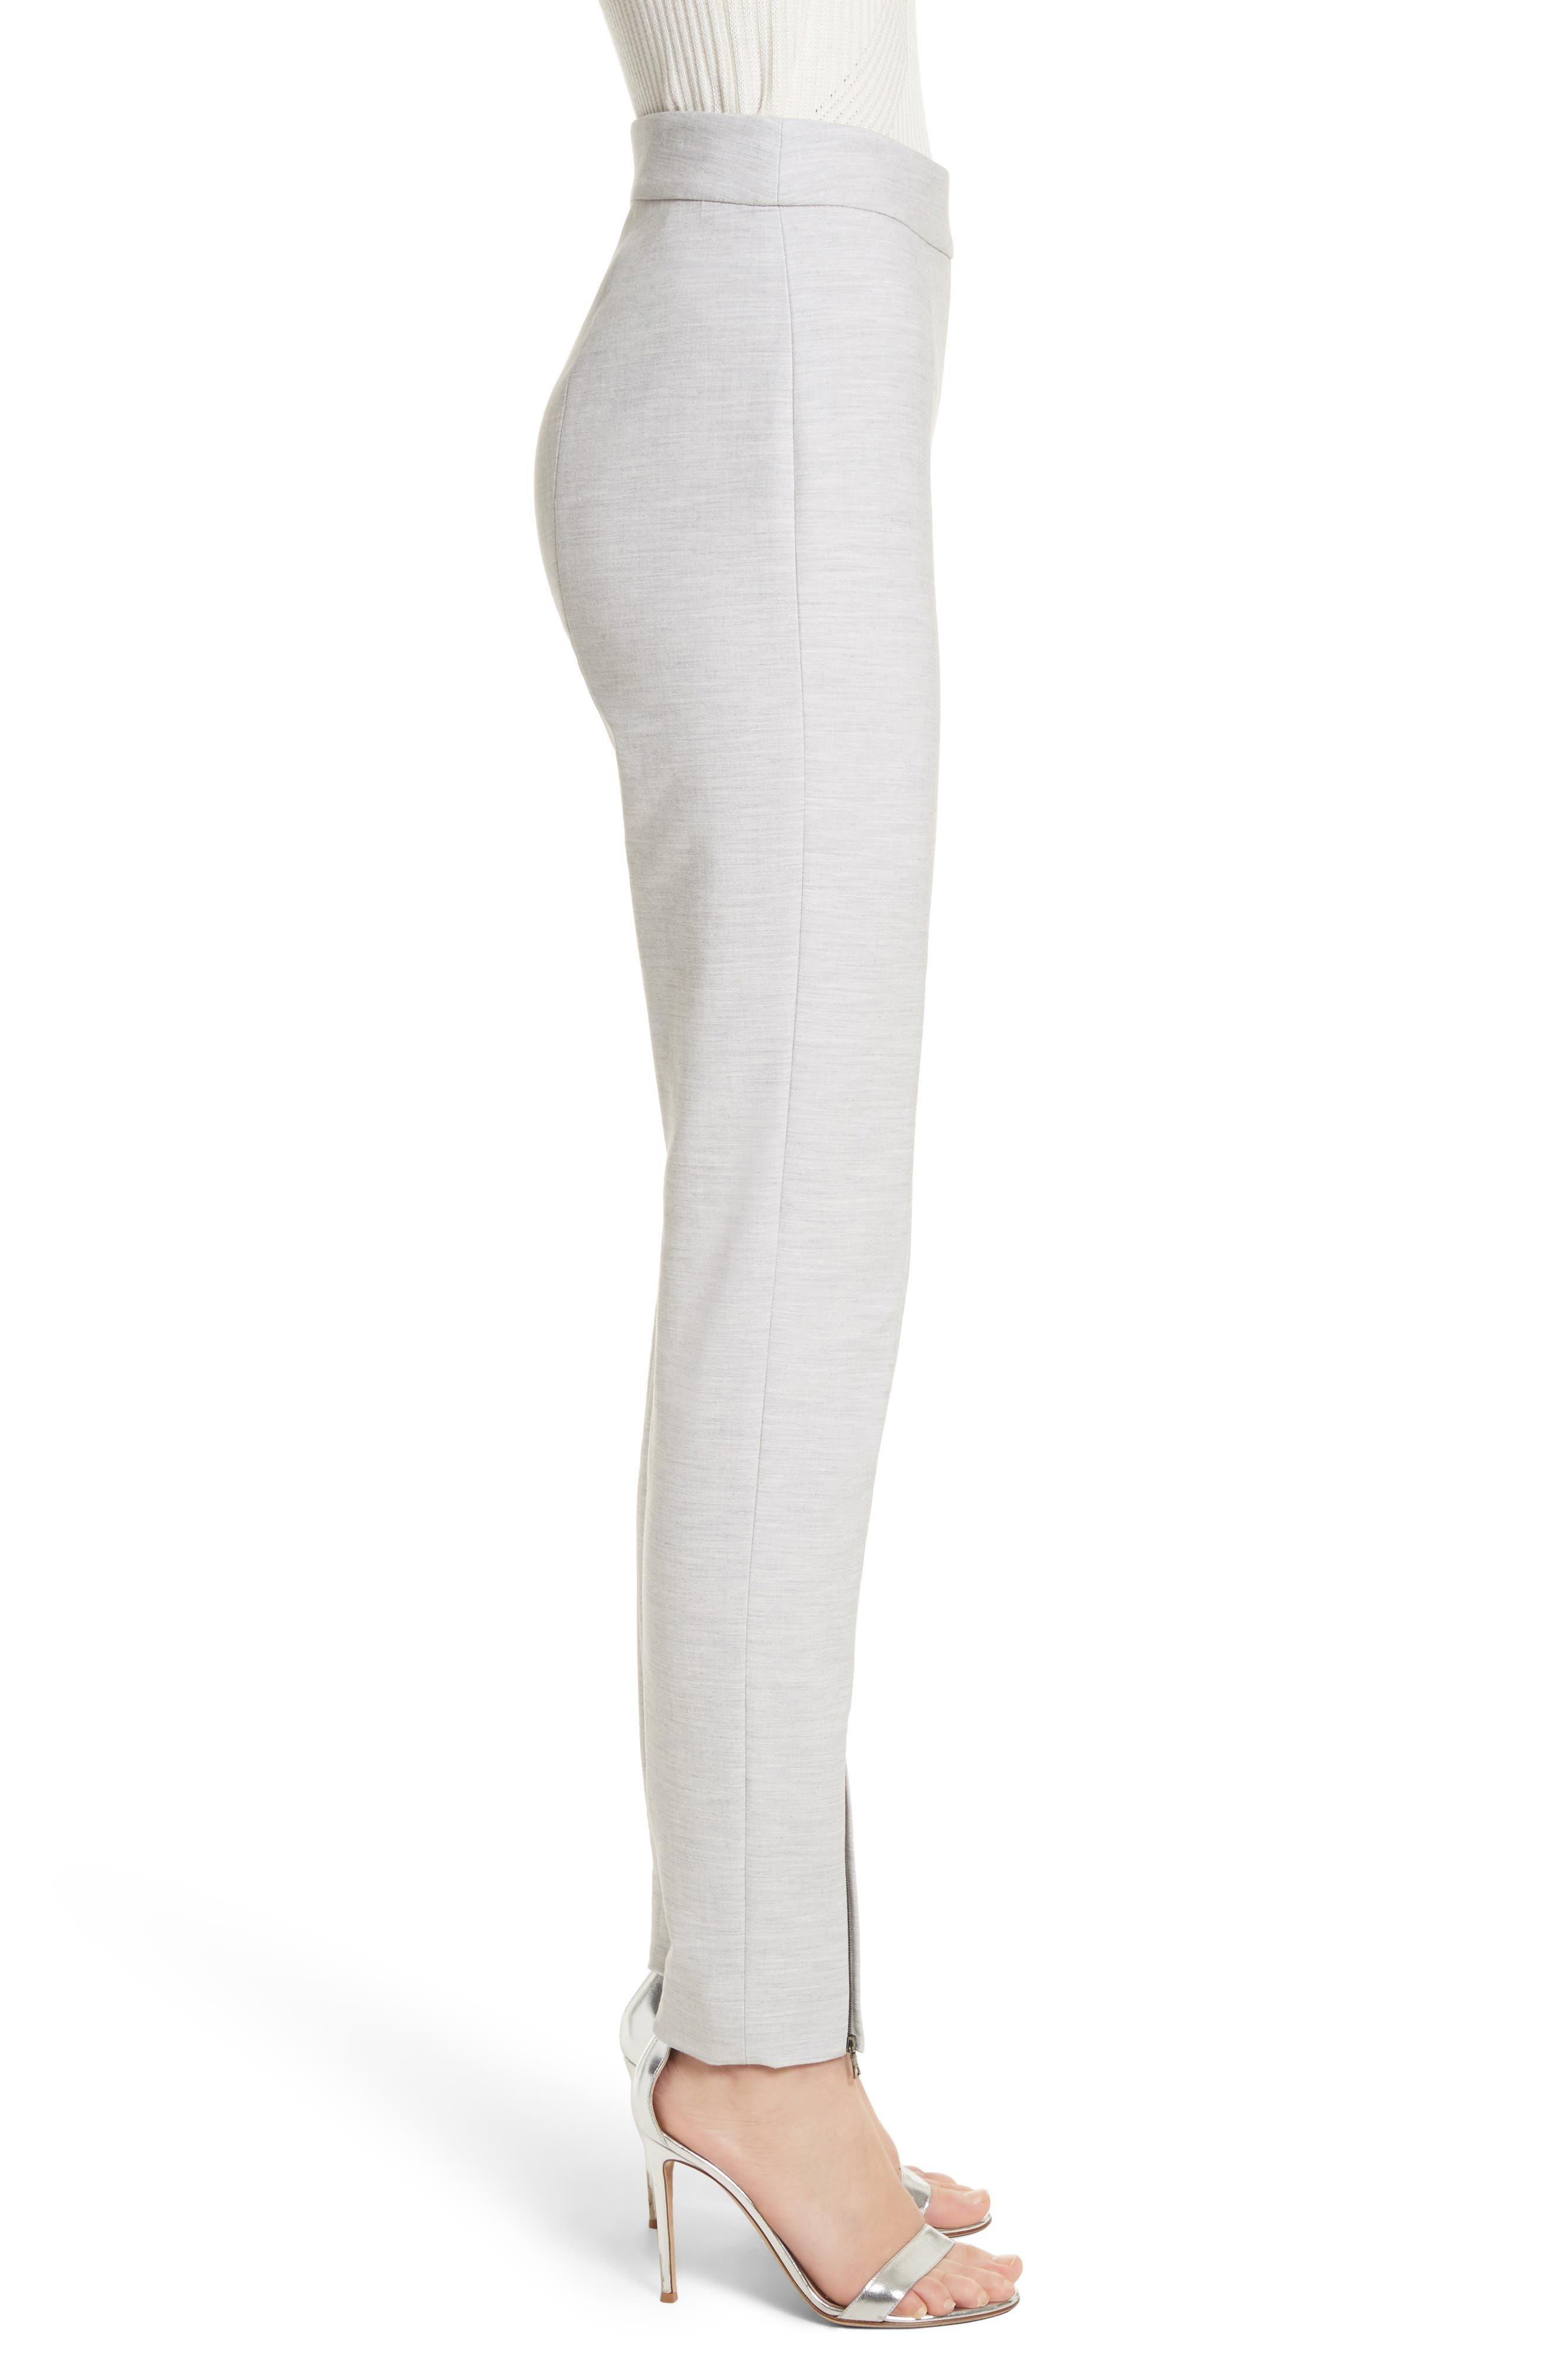 Summer Bella Double Weave Pants,                             Alternate thumbnail 8, color,                             Light Grey Melange